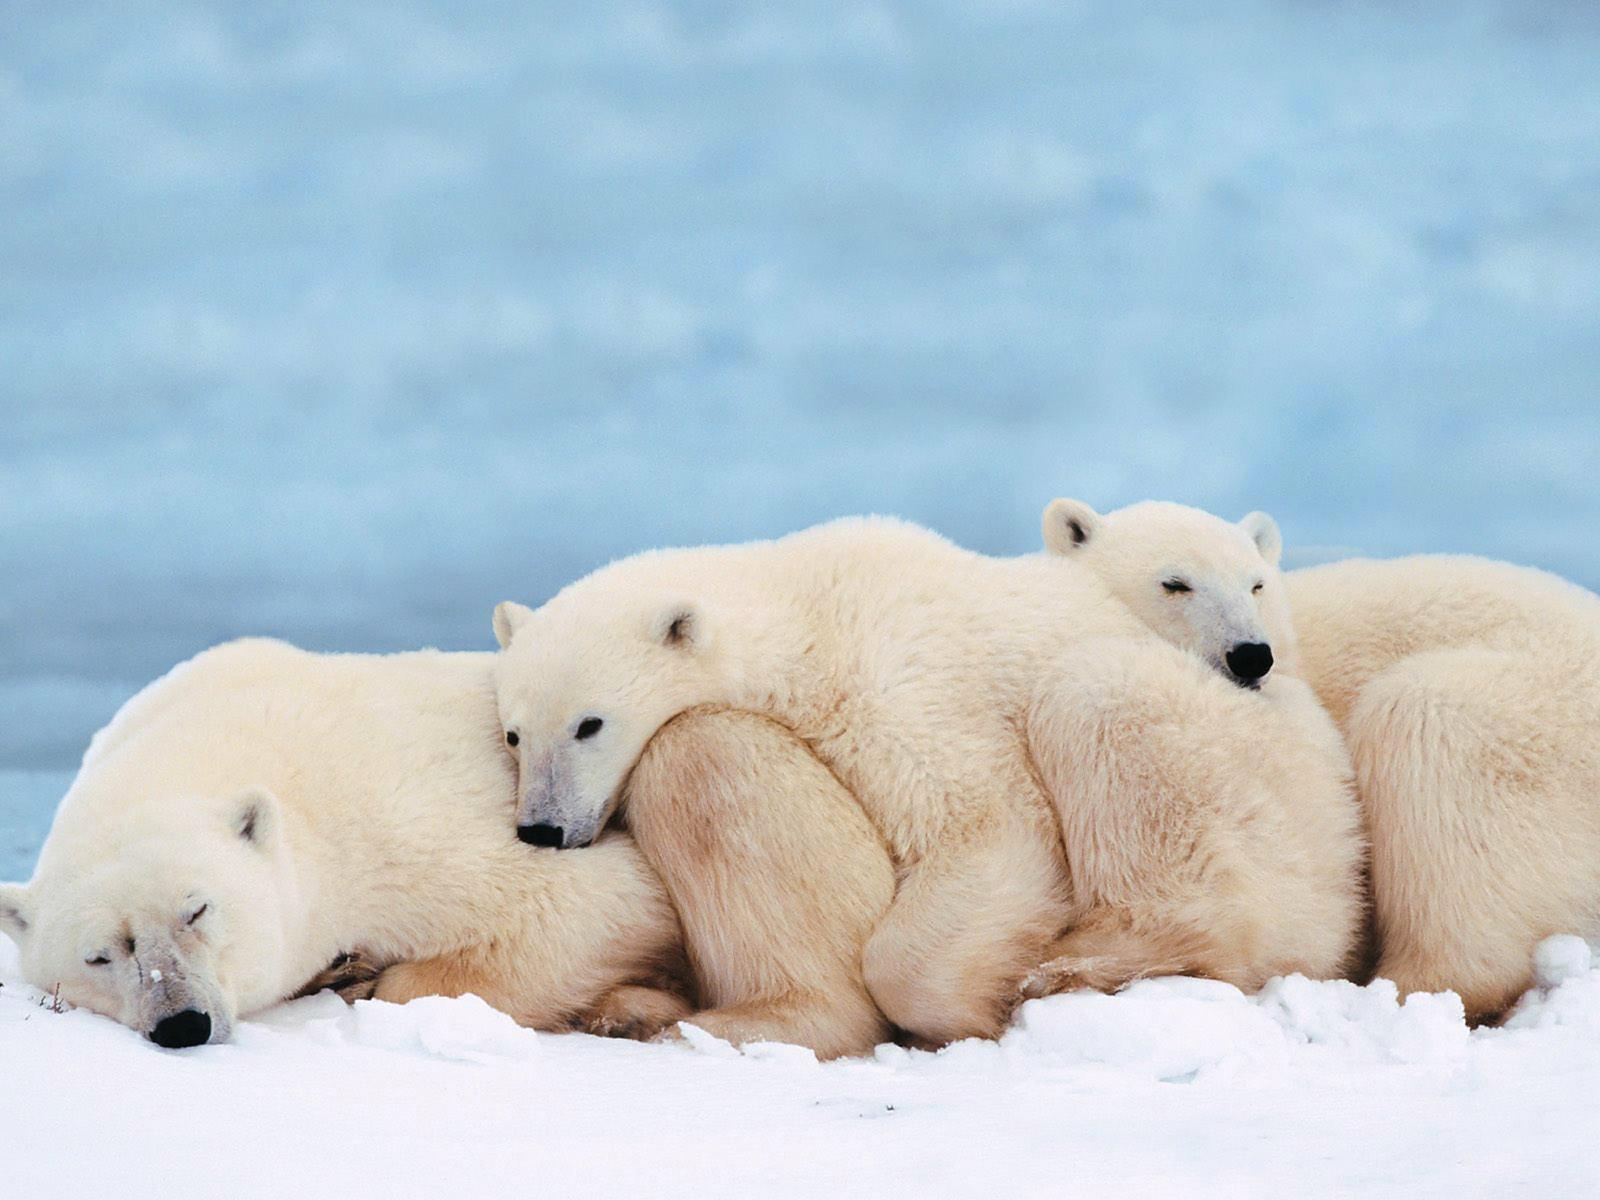 Otter Cute Wallpaper Polar Bear Fun Animals Wiki Videos Pictures Stories